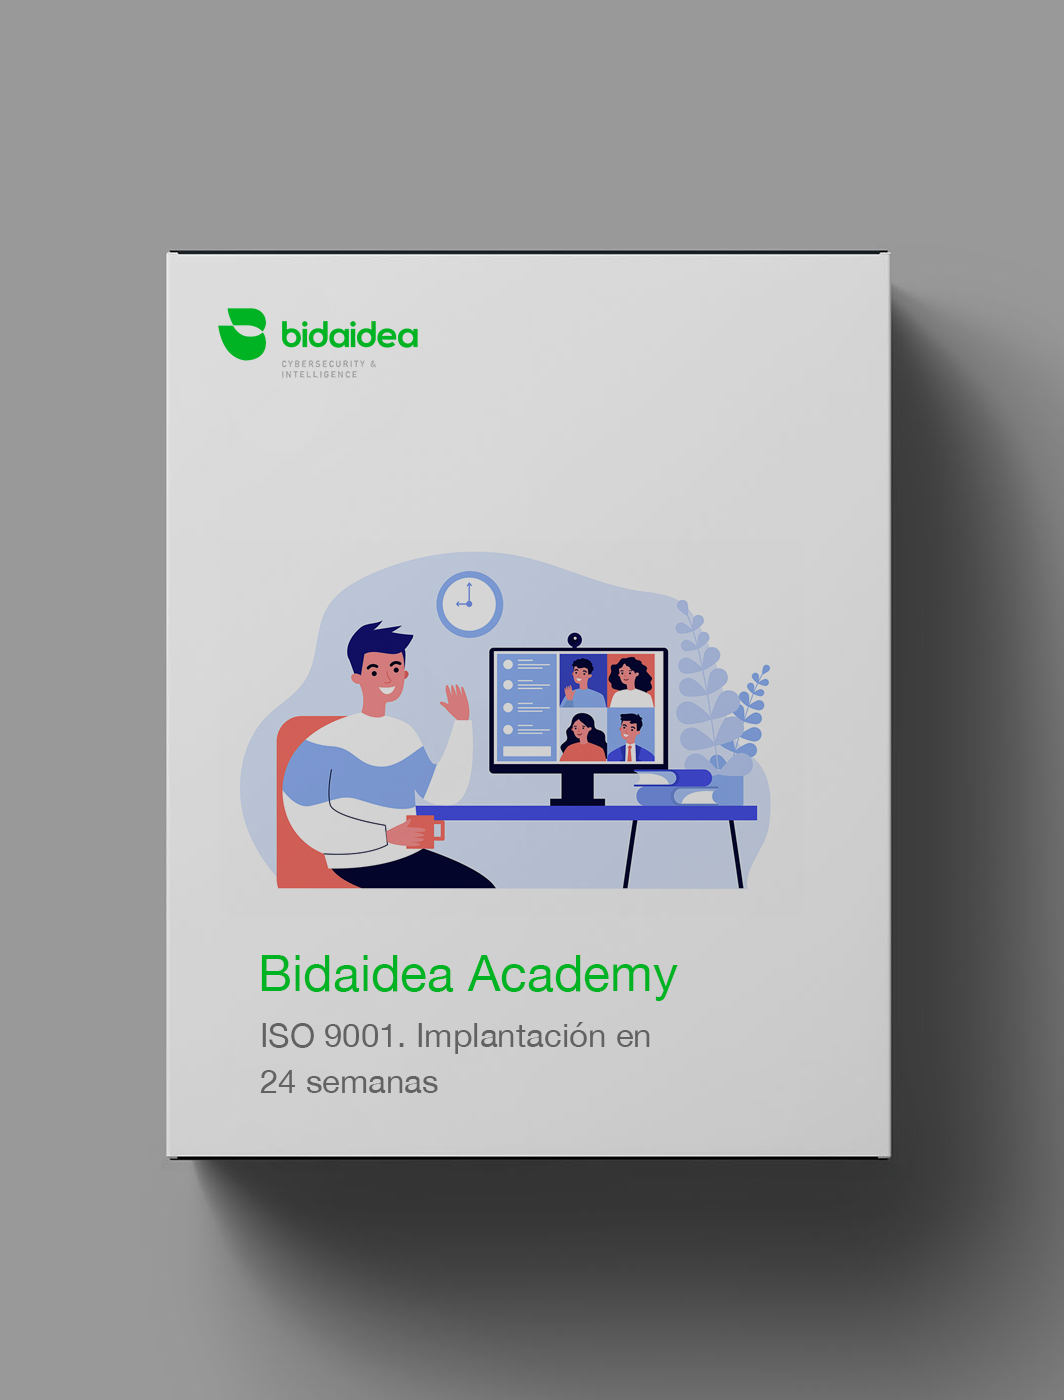 cyberpacks bidaidea academy 08 - Empresa de Ciberseguridad